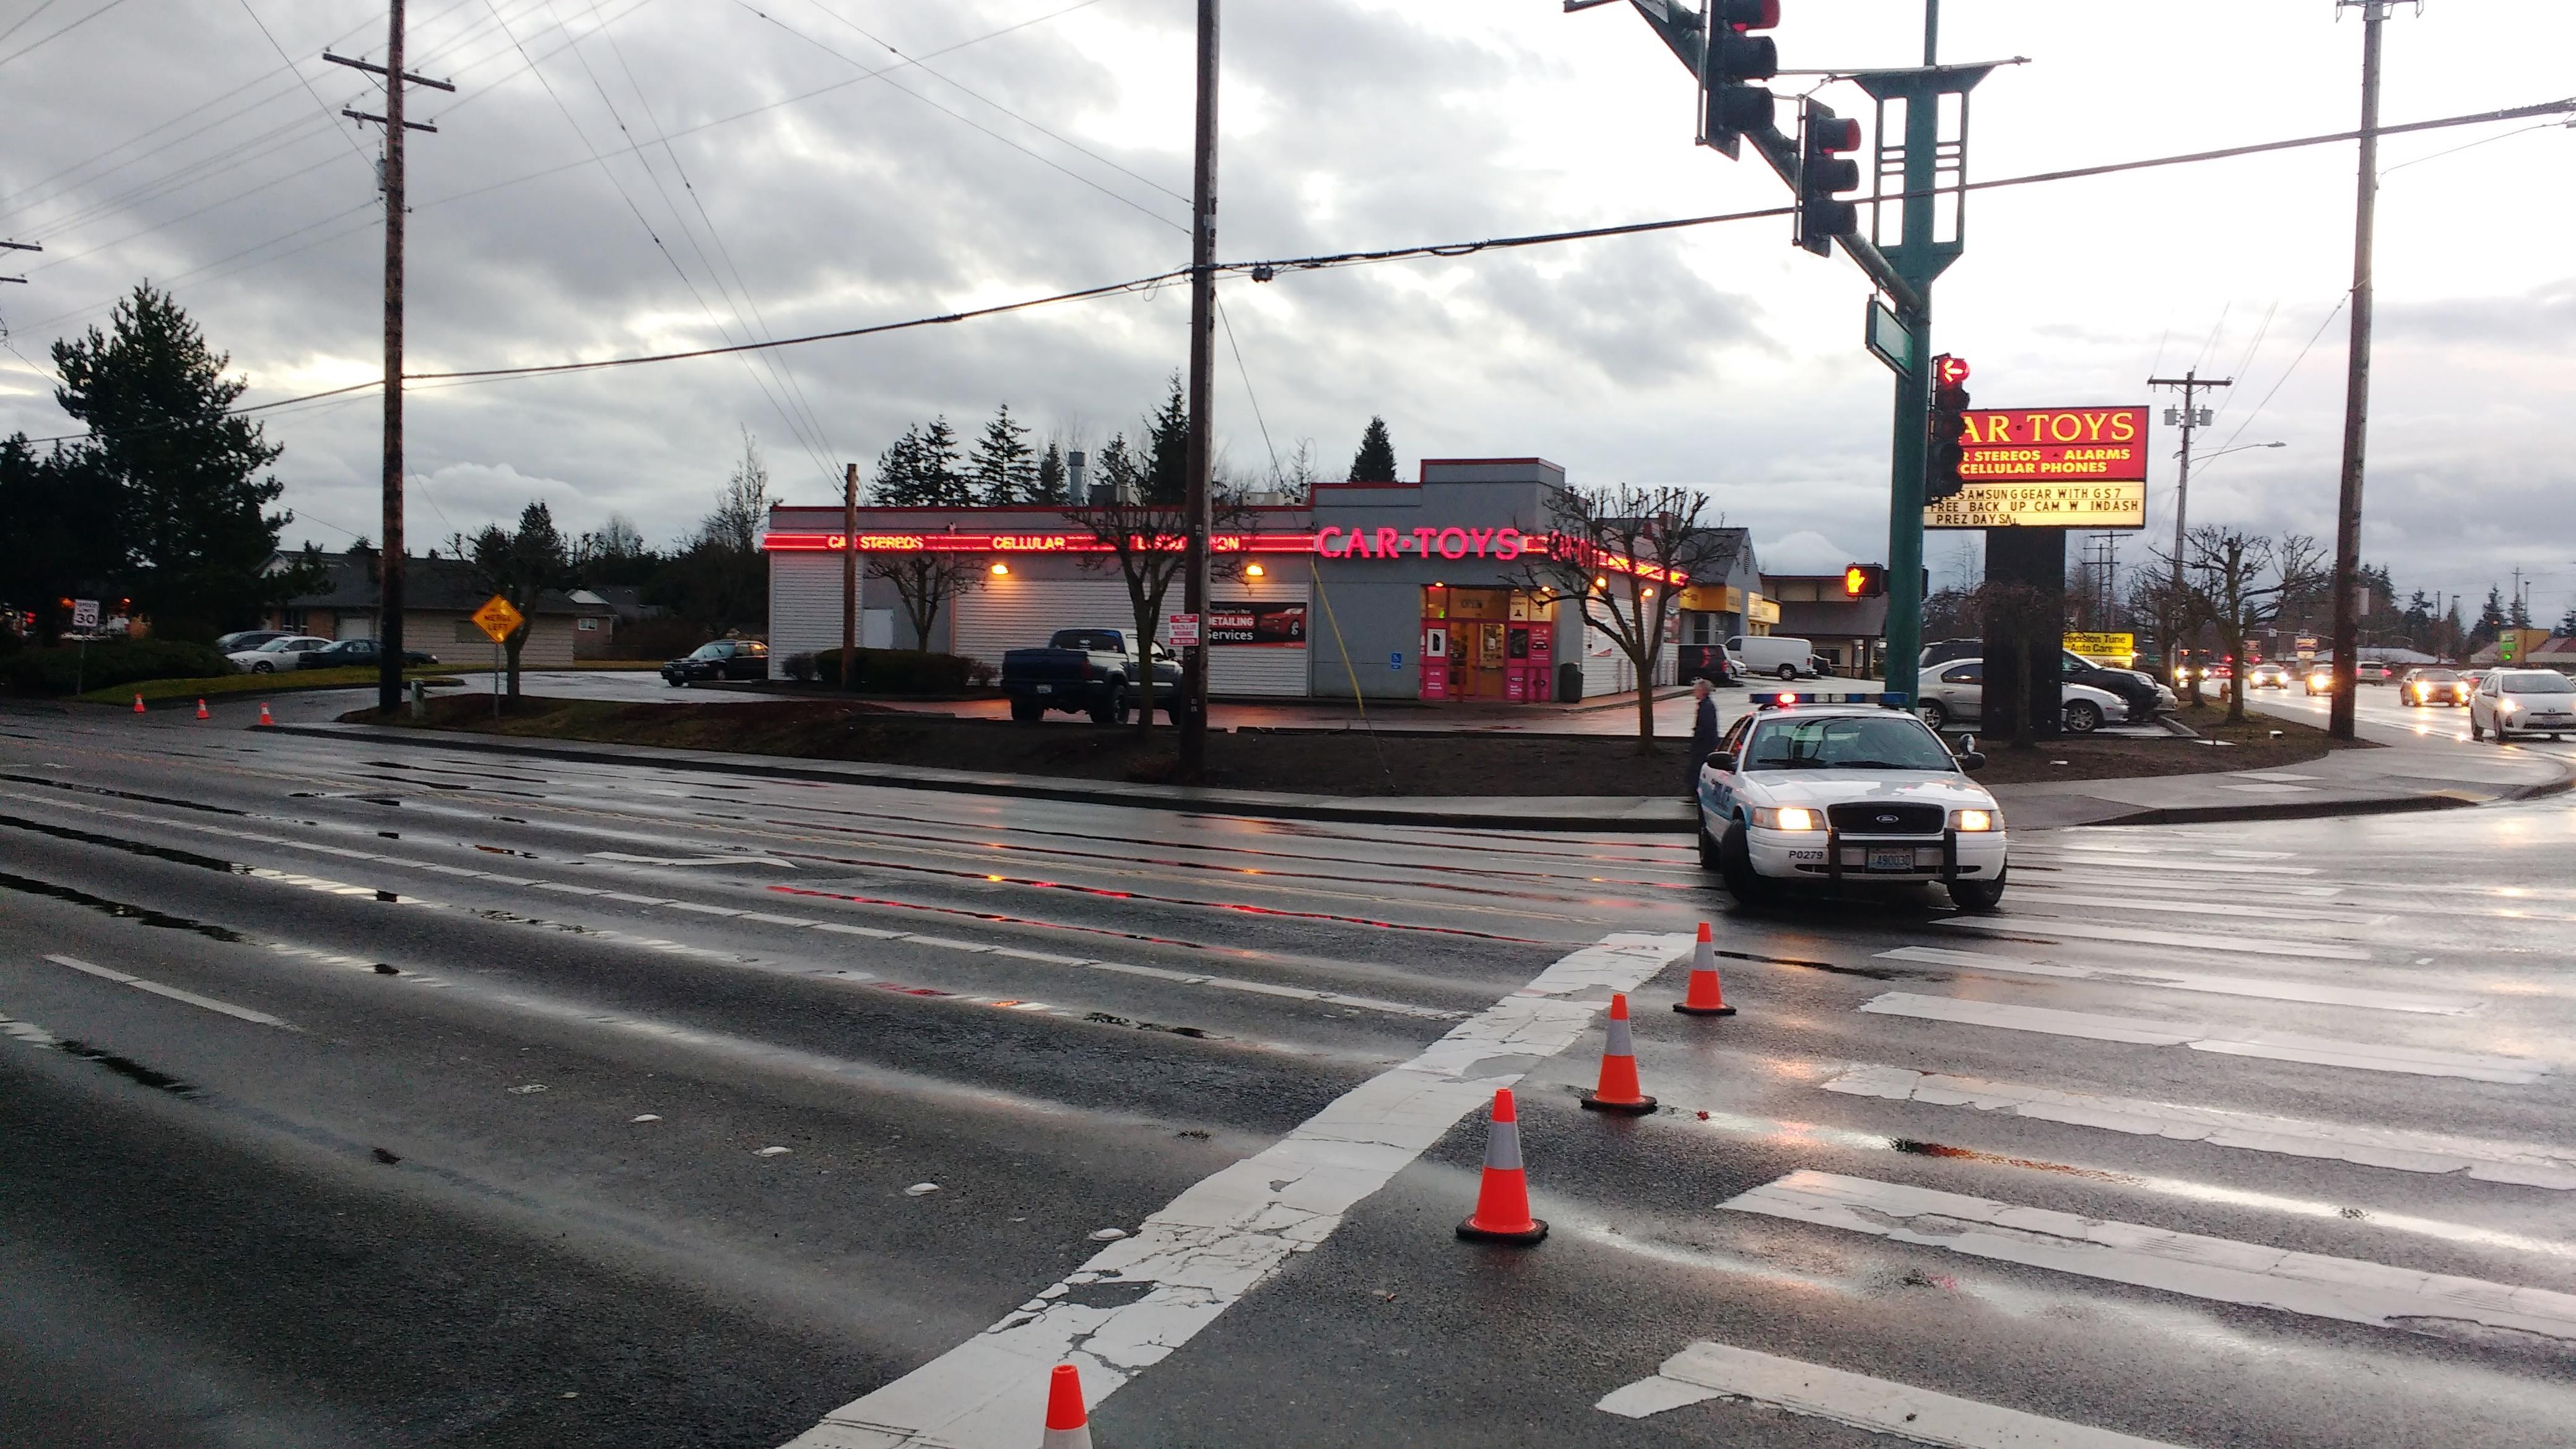 Gunfire Shuts Down 4th Avenue West Myeverettnews Com